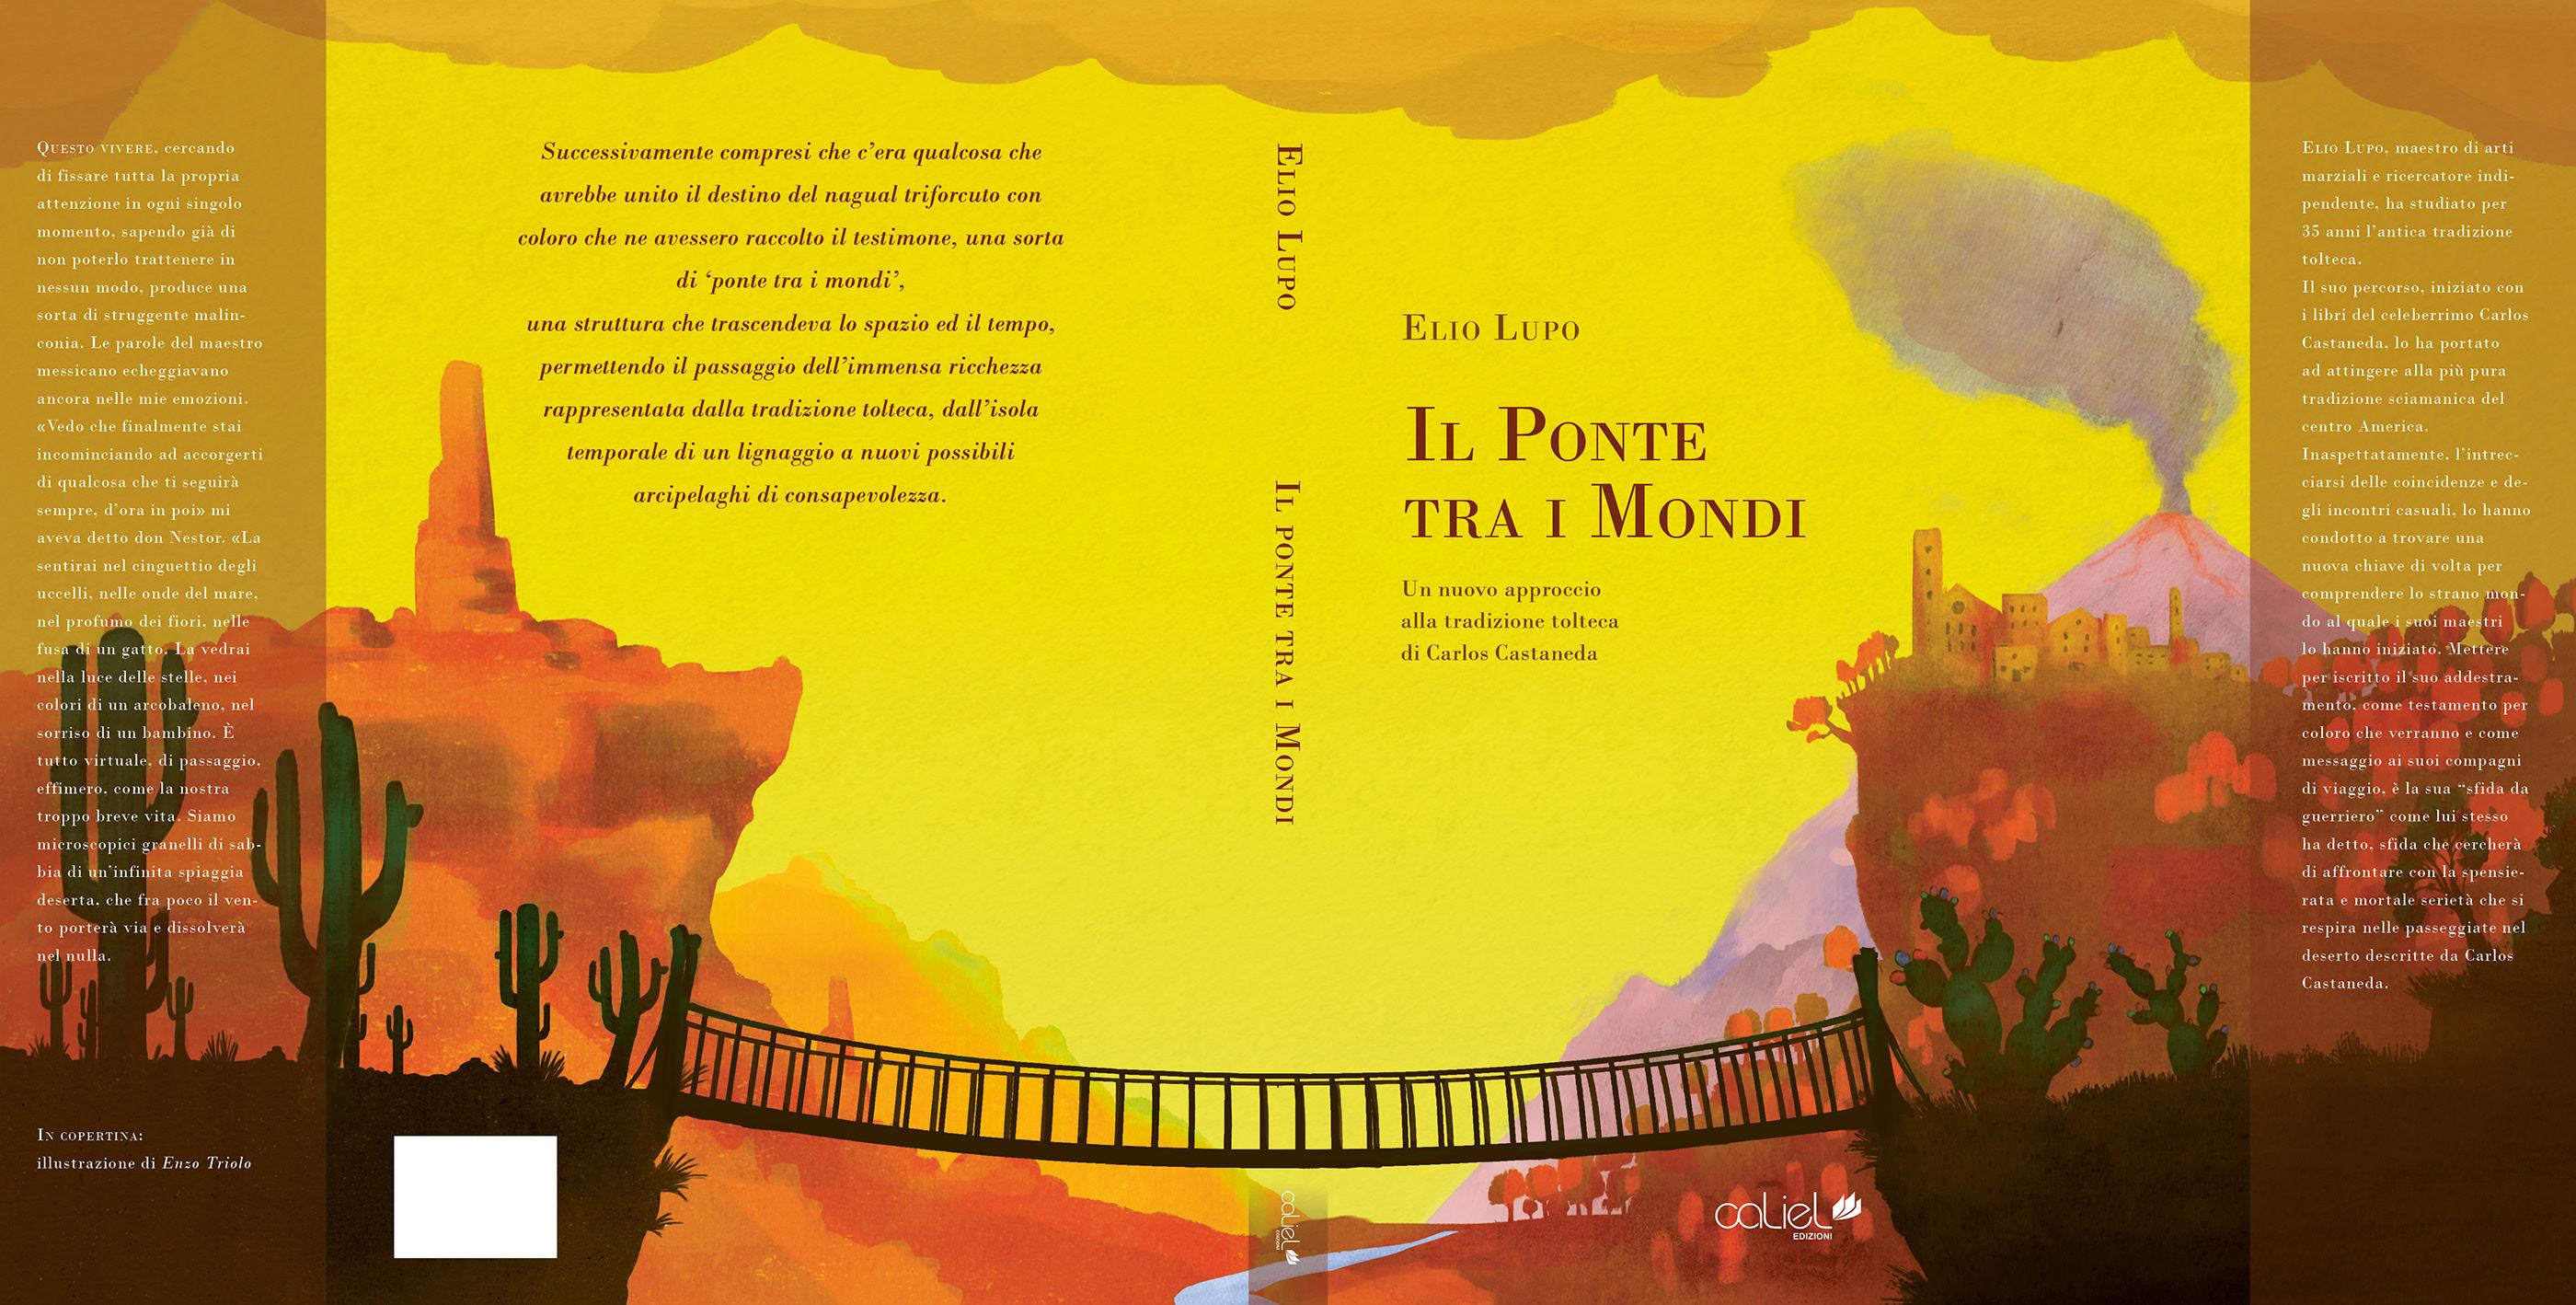 Il ponte tra i mondi | book cover on Behance